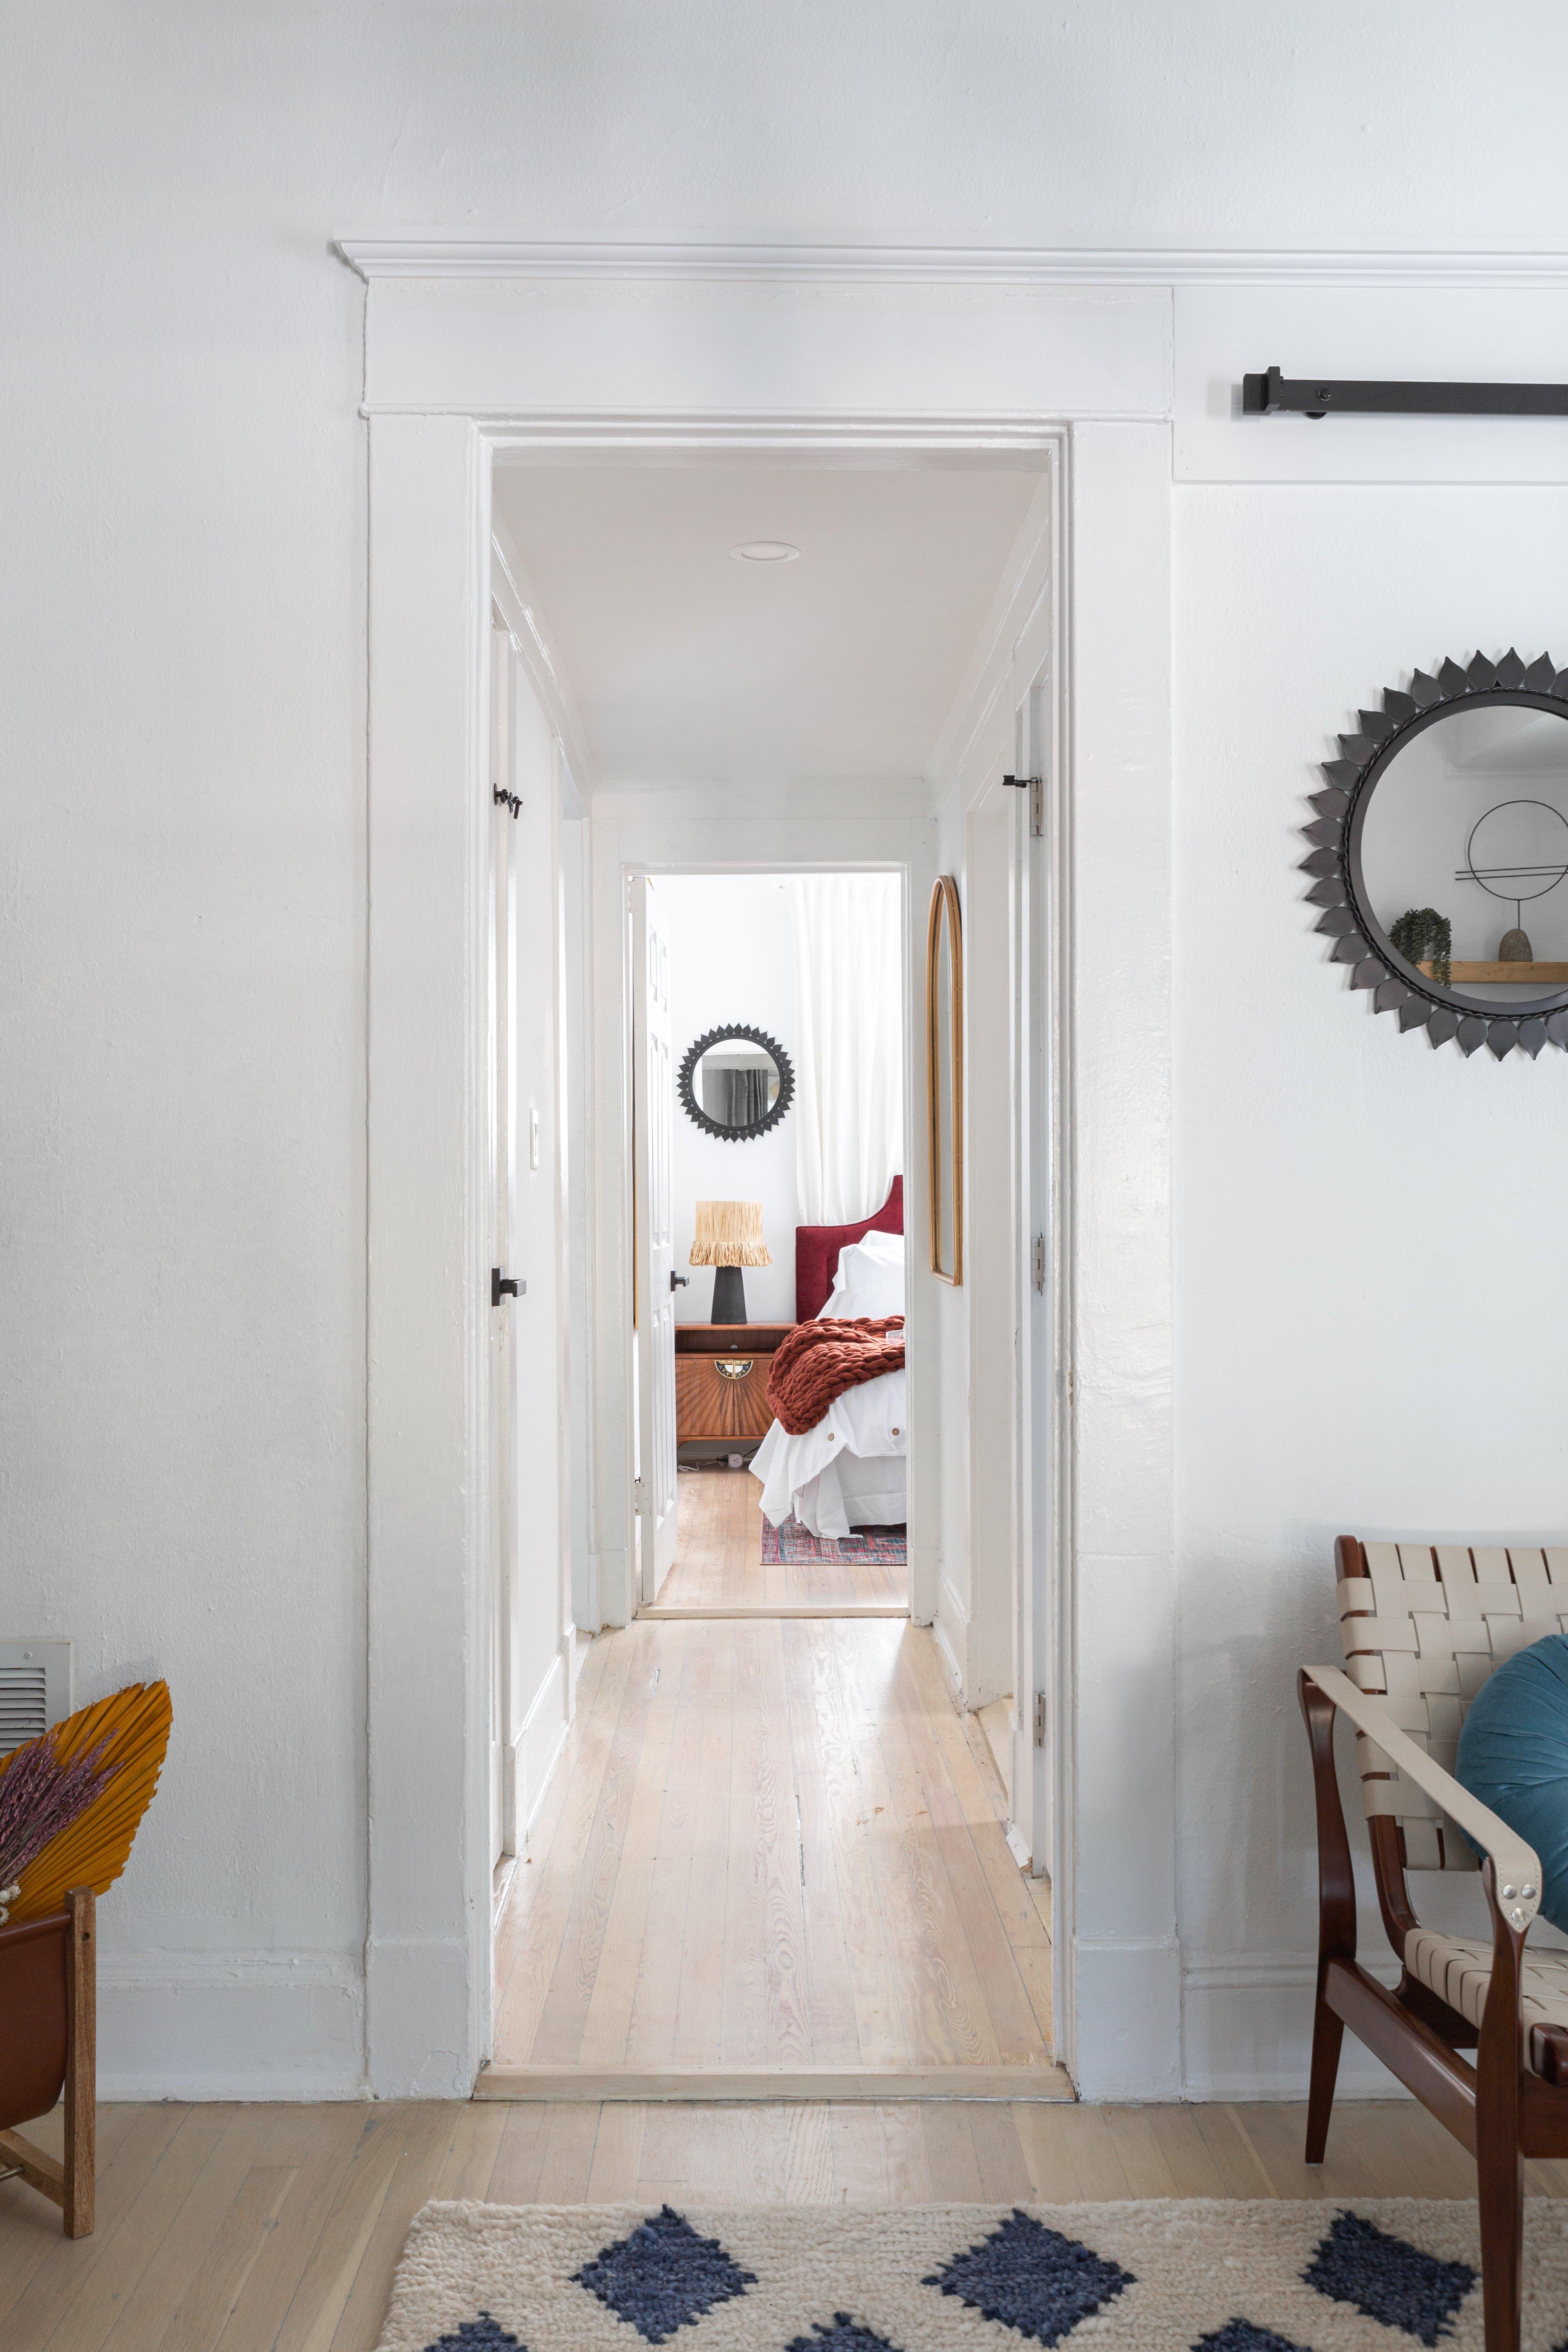 17 hallway 20210810-IMG_2610.jpg